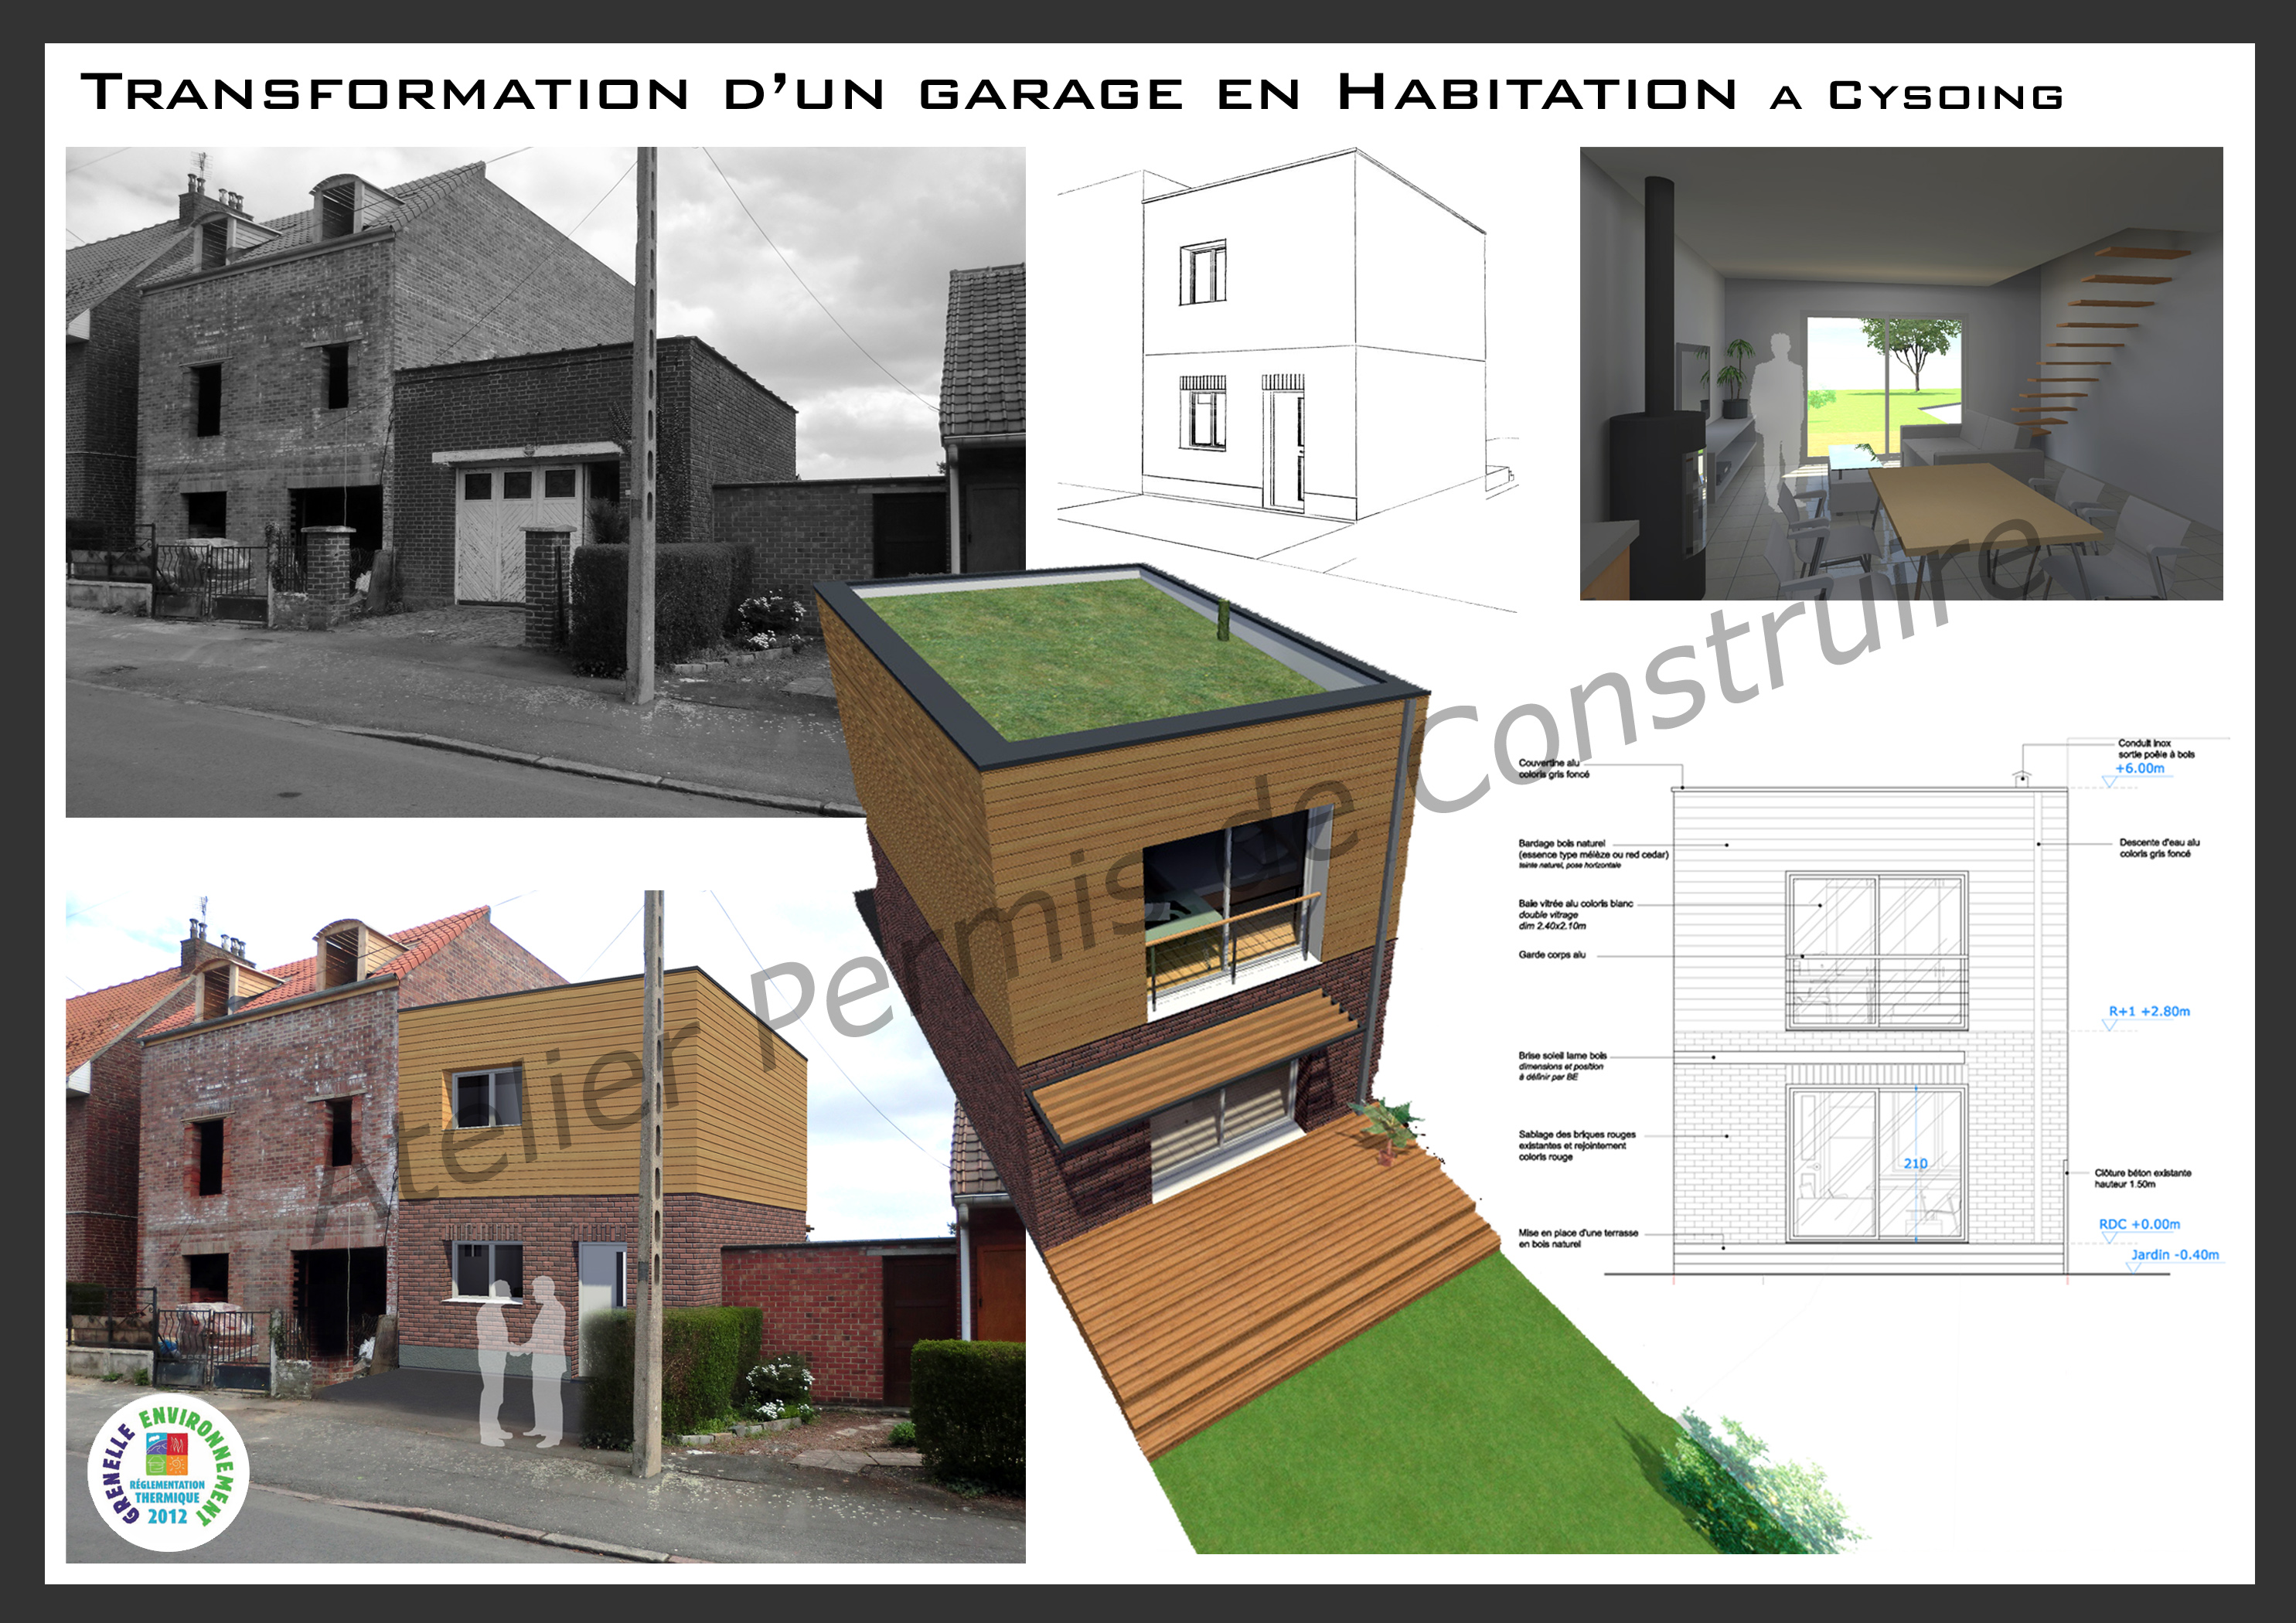 Transformation d 39 un garage en habitation cysoing - Transformation garage en logement ...